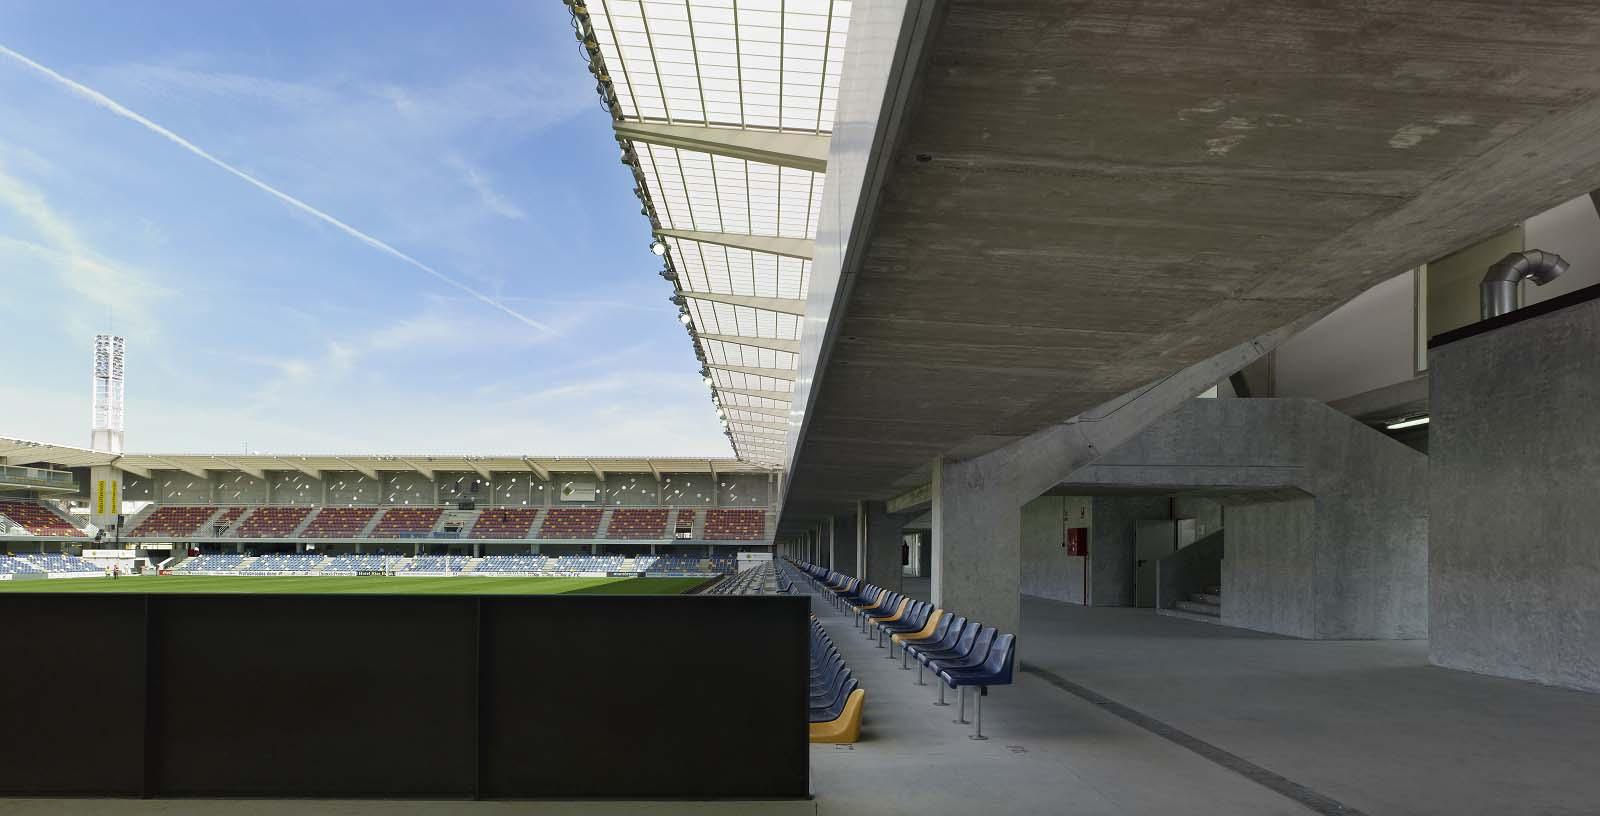 Pasaron_Stadium_04_Architecture_IDOM_Copyright